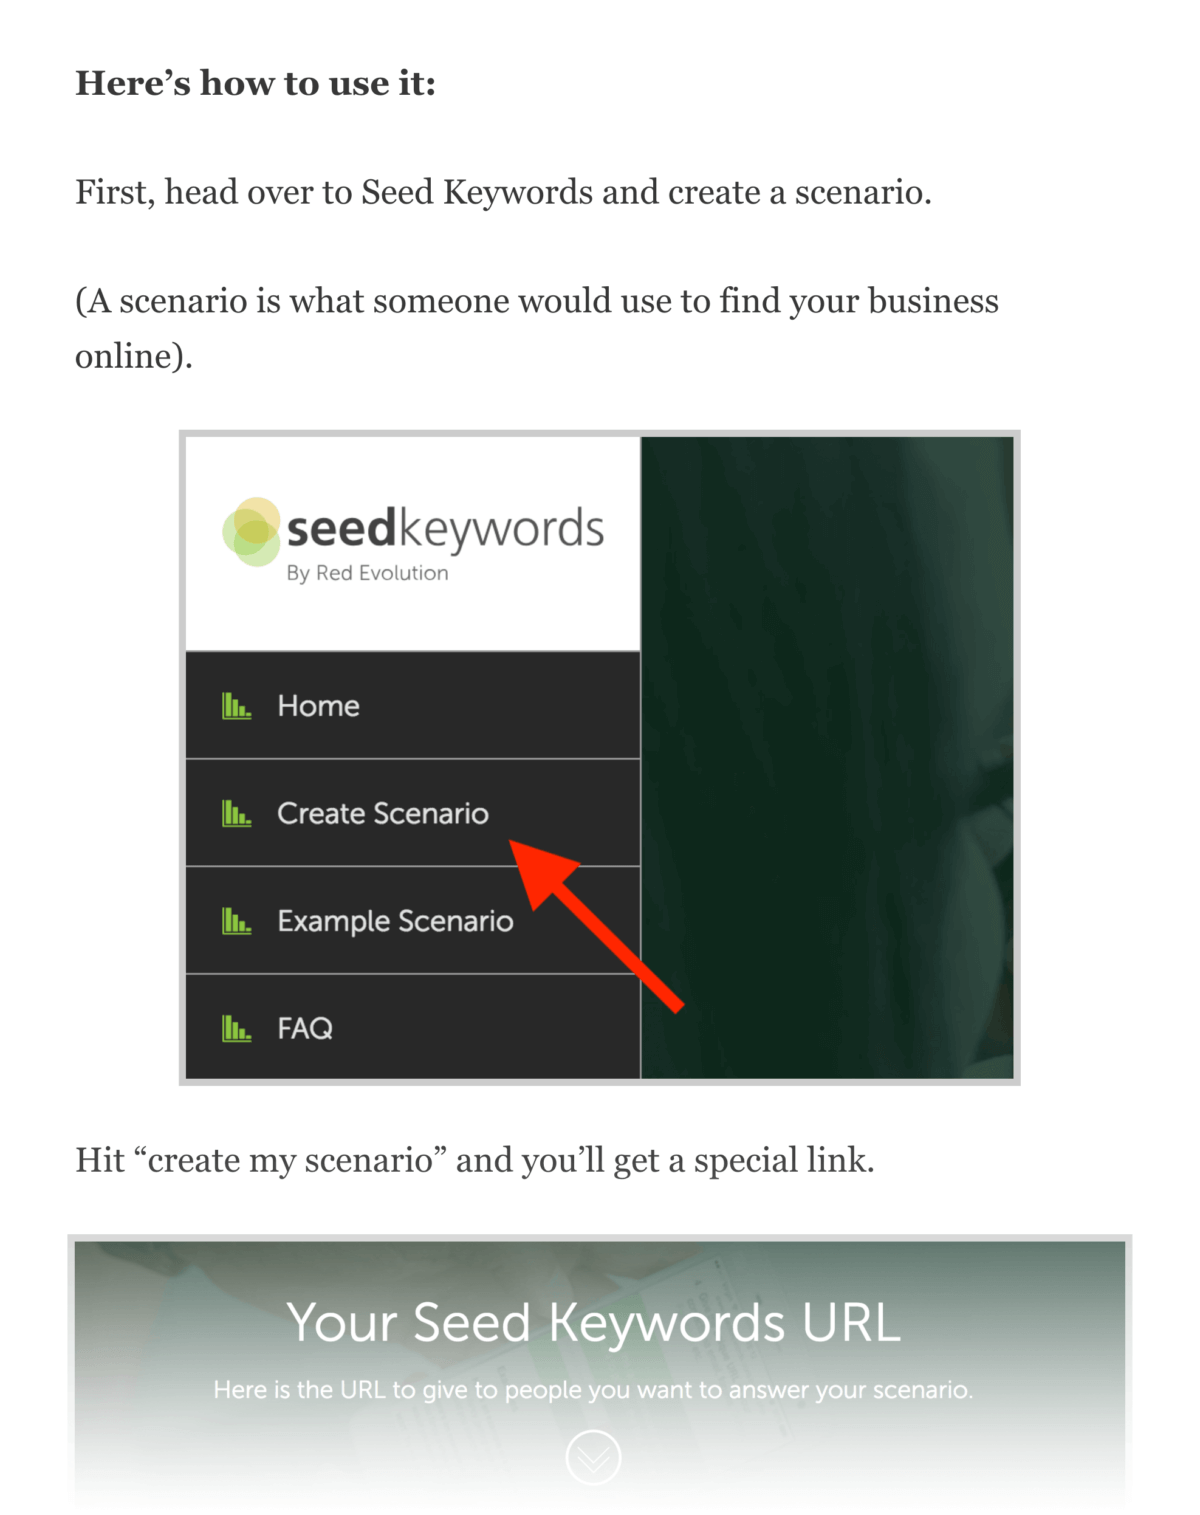 Seed keywords – Steps